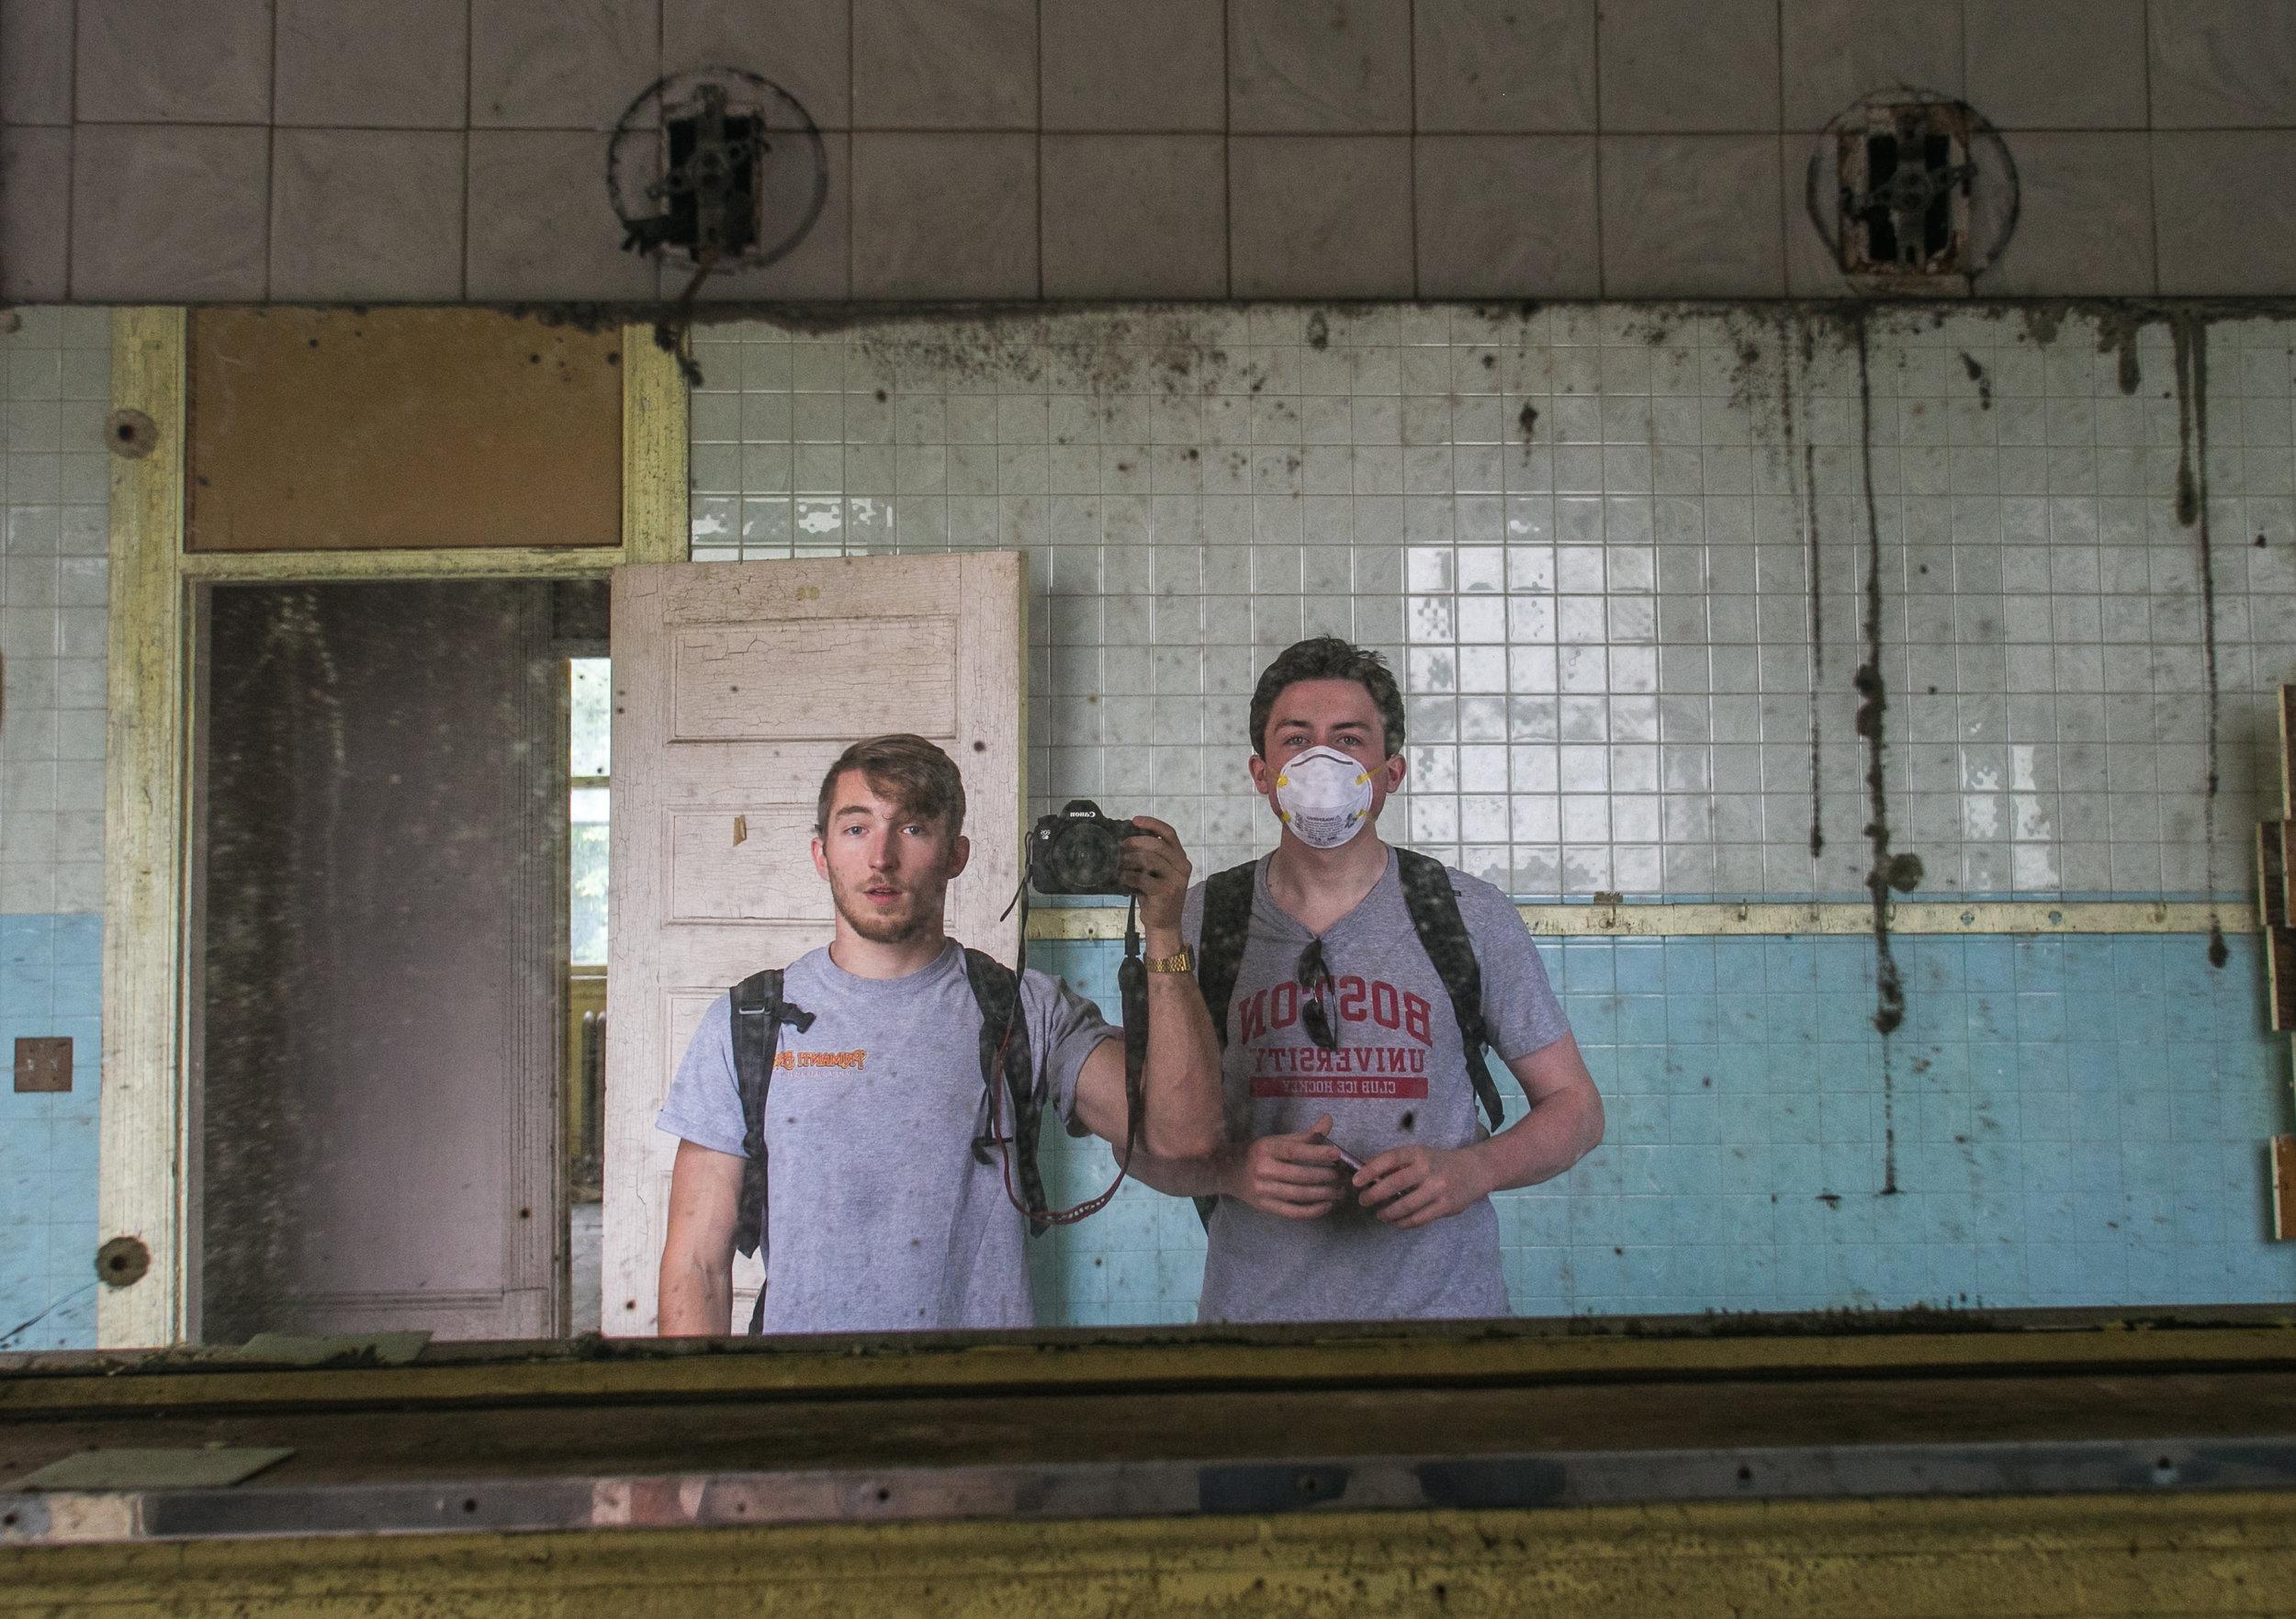 Abandoned Nursing College 3 - Mike Schwarz-7.jpg